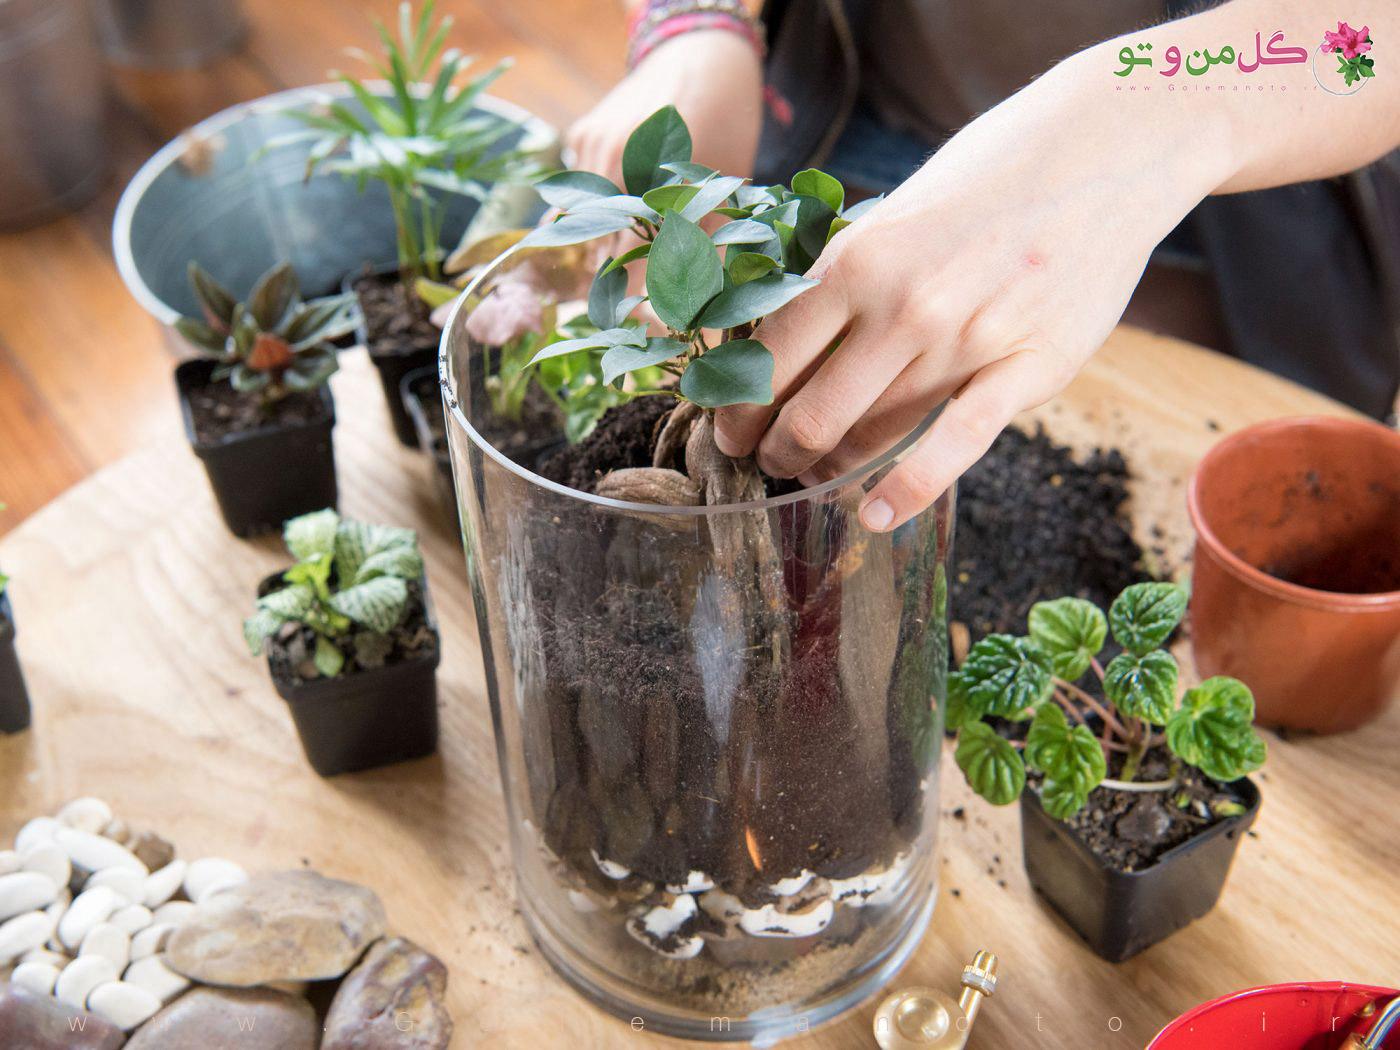 آموزش ساخت تراریوم - کاشت گیاه